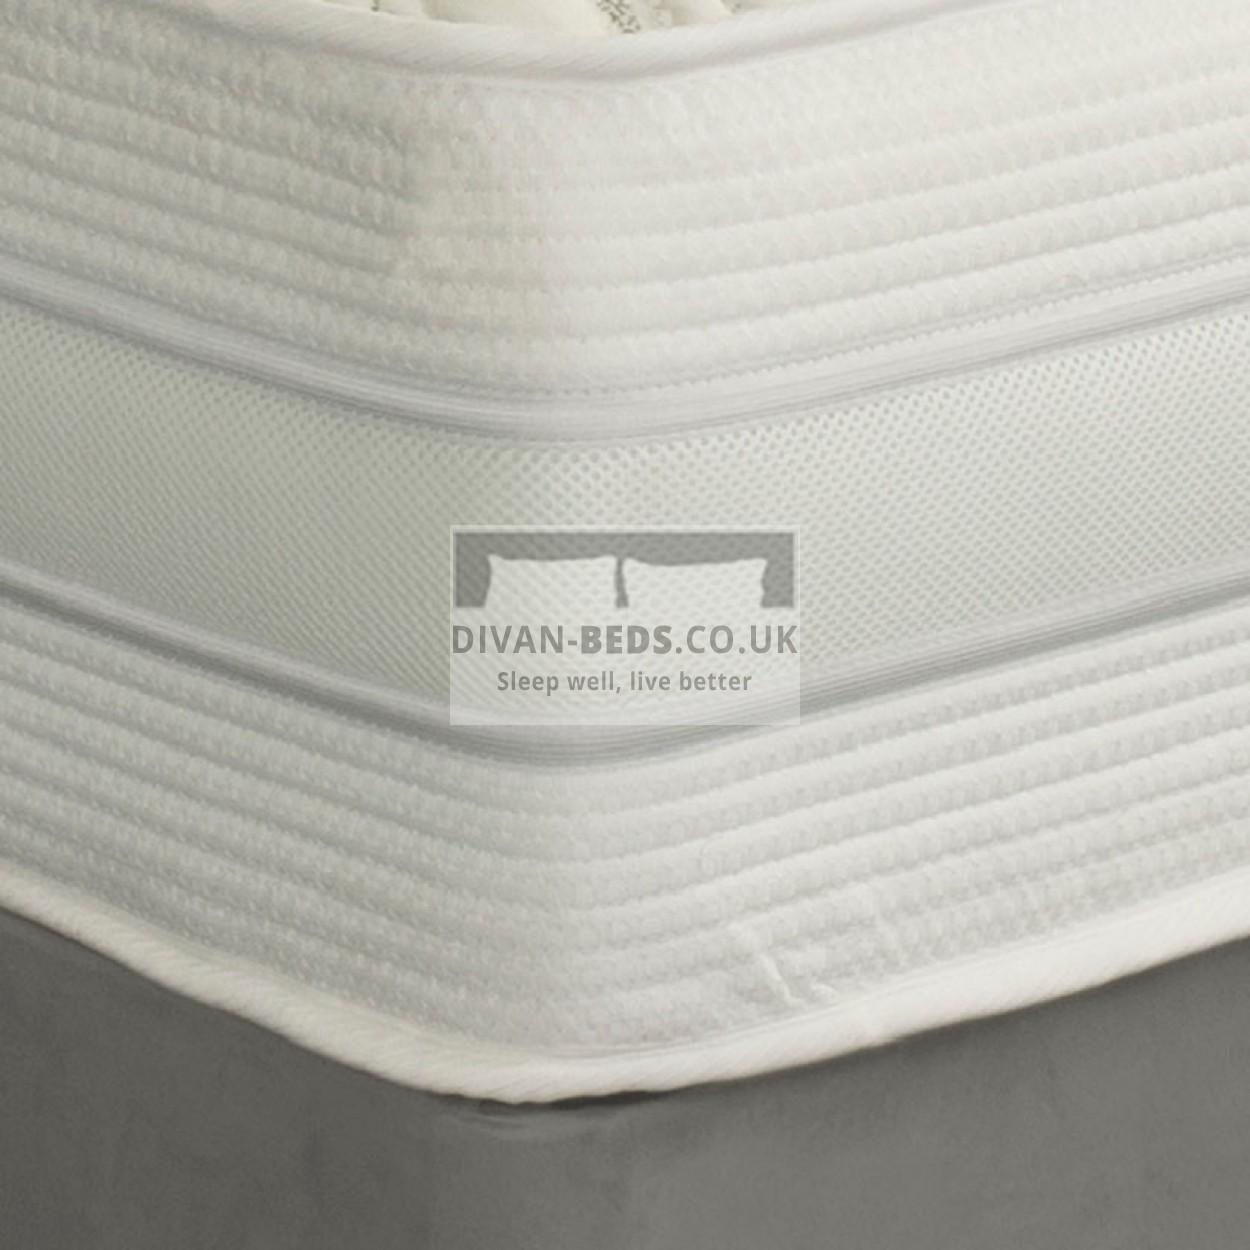 2500 Pocket Spring High Density Memory Foam Mattress With